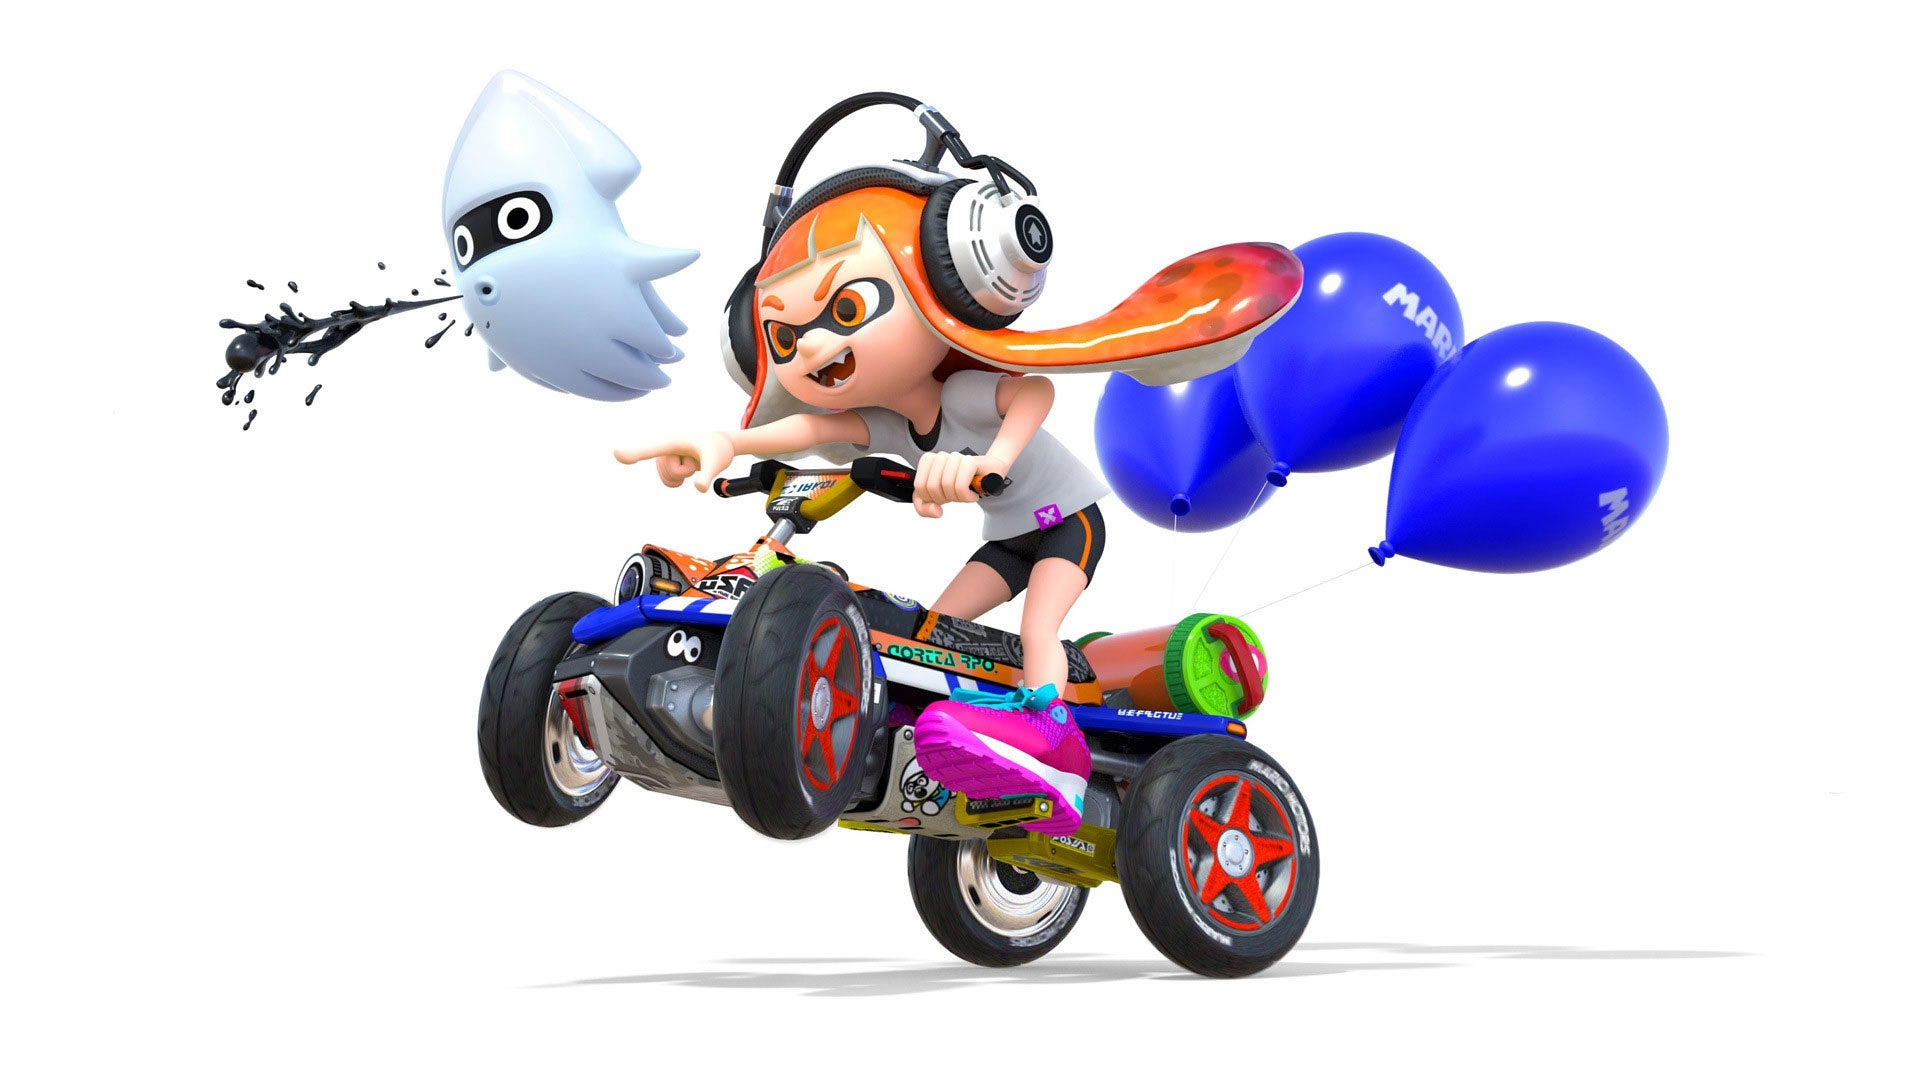 Mario Kart Update Removes Offensive Gesture